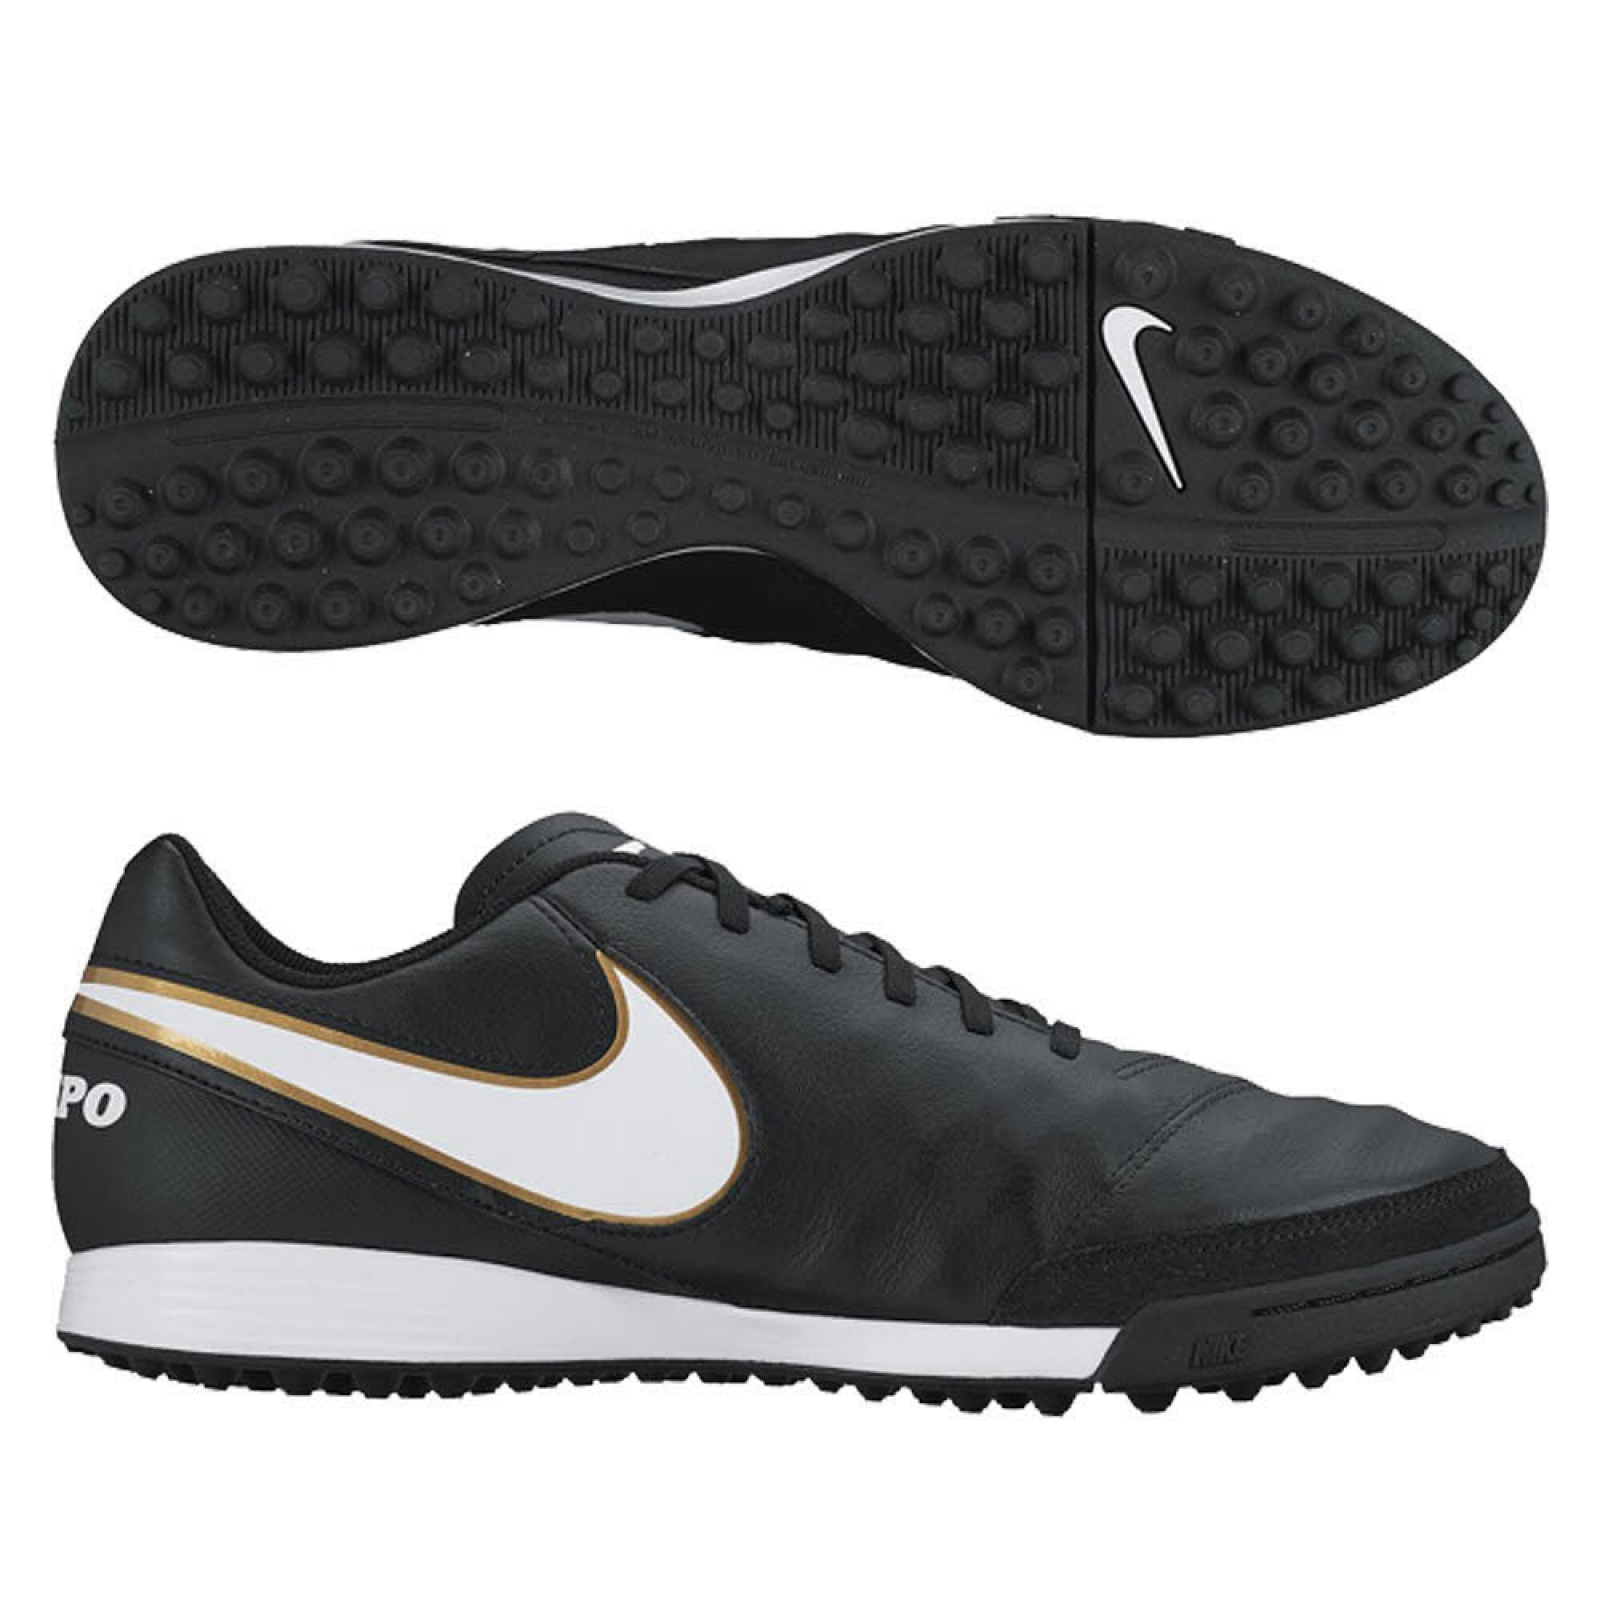 Leather Tf Nike Fussballschuhe Multinocken Tiempo Genio